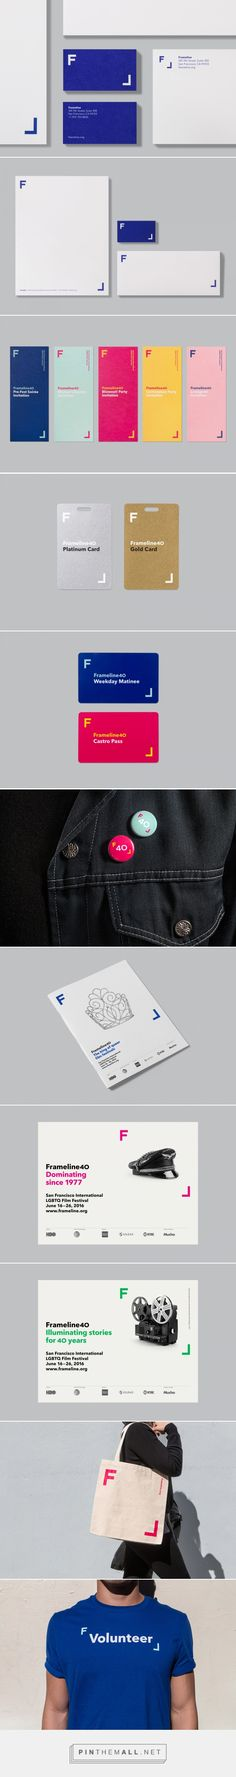 New Brand Identity for Frameline 40 by Mucho — BP&O